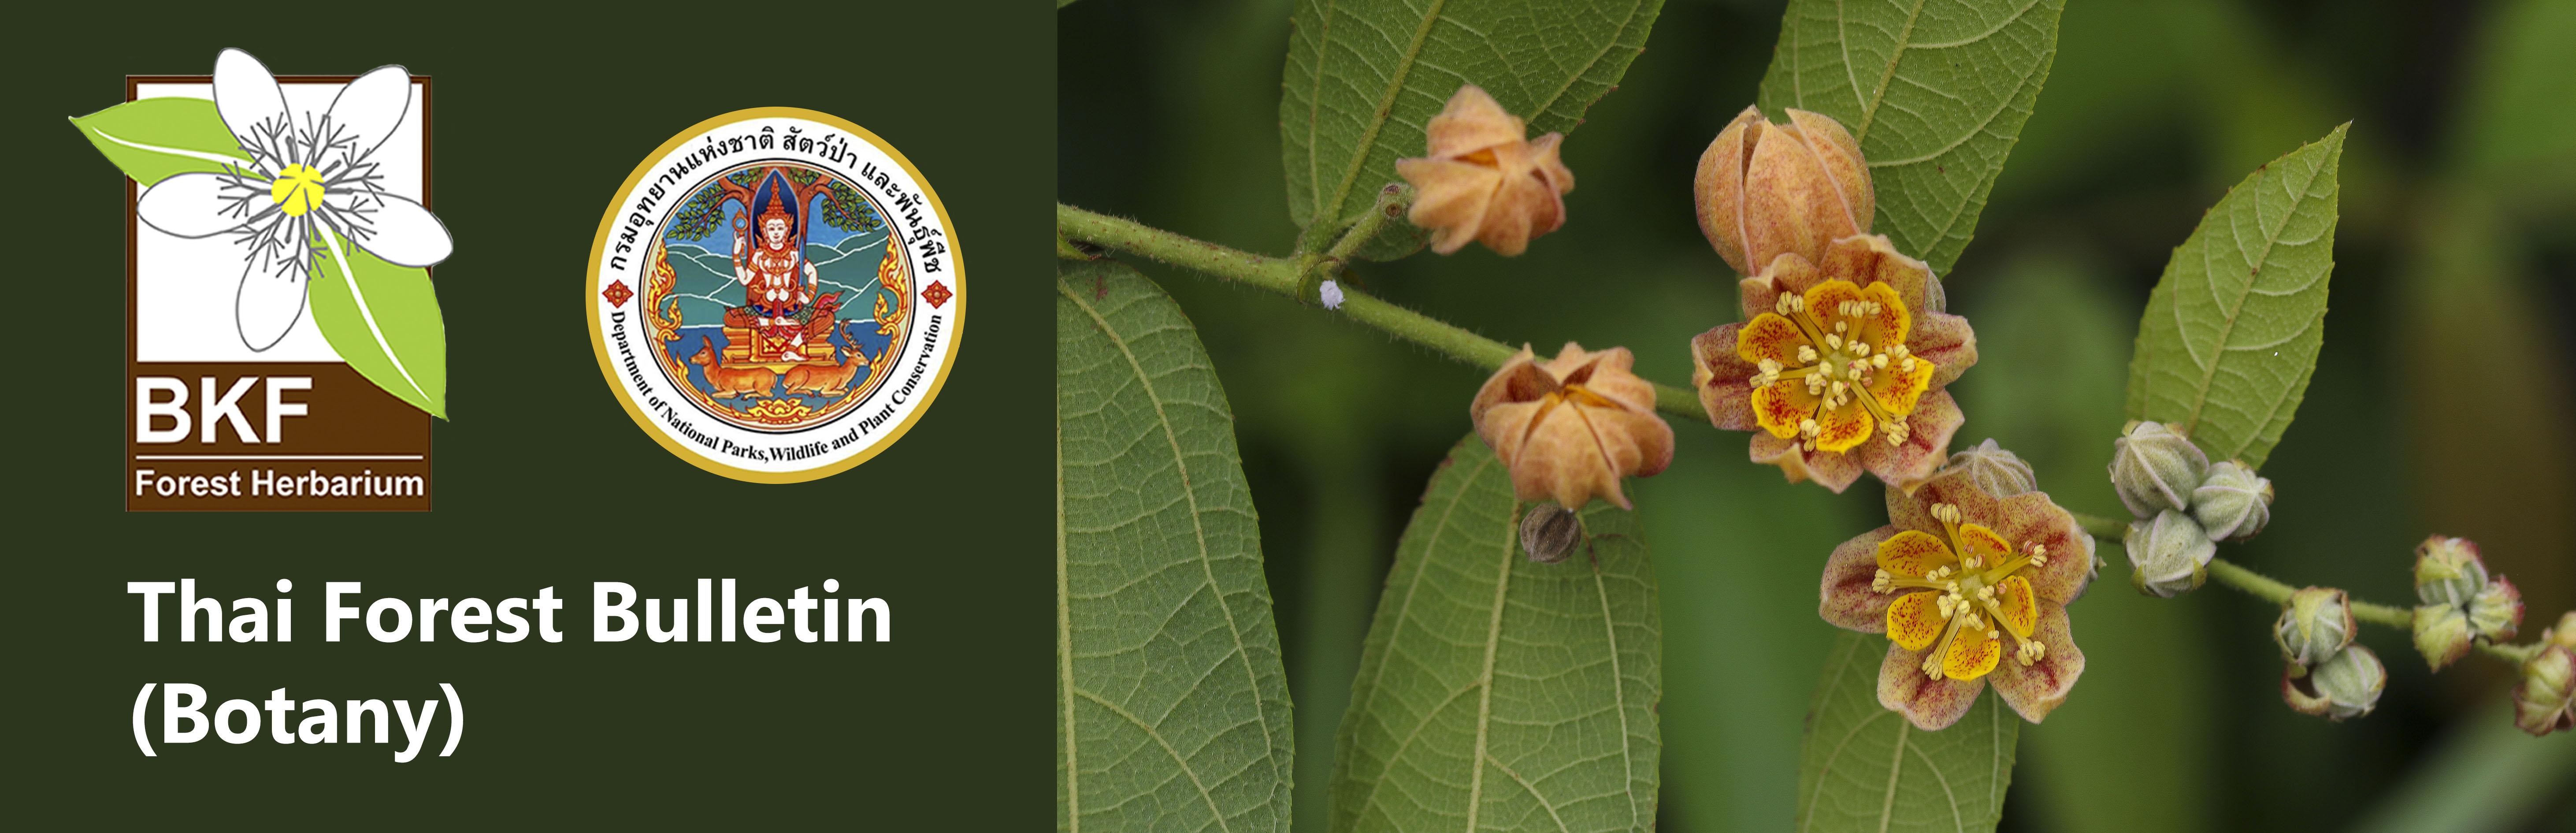 Thai Forest Bulletin (Botany)